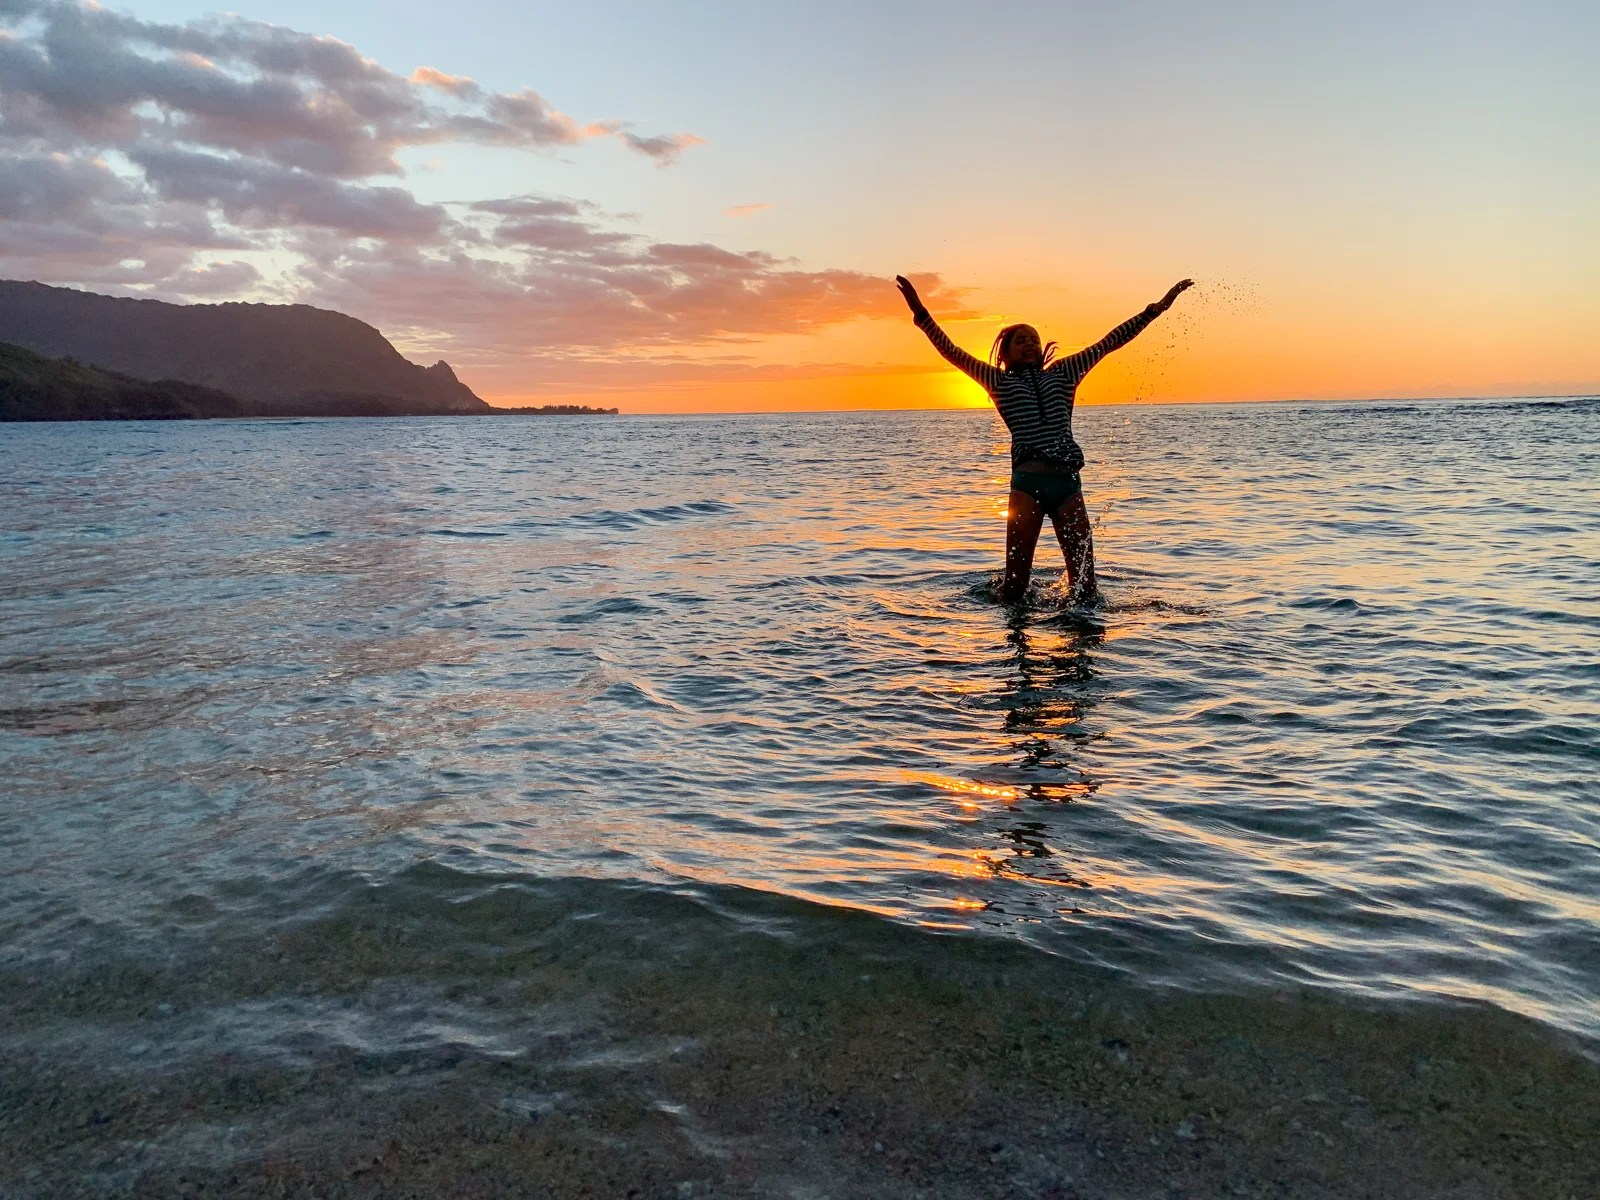 11 Fun Activities to Do With Kids in Kauai